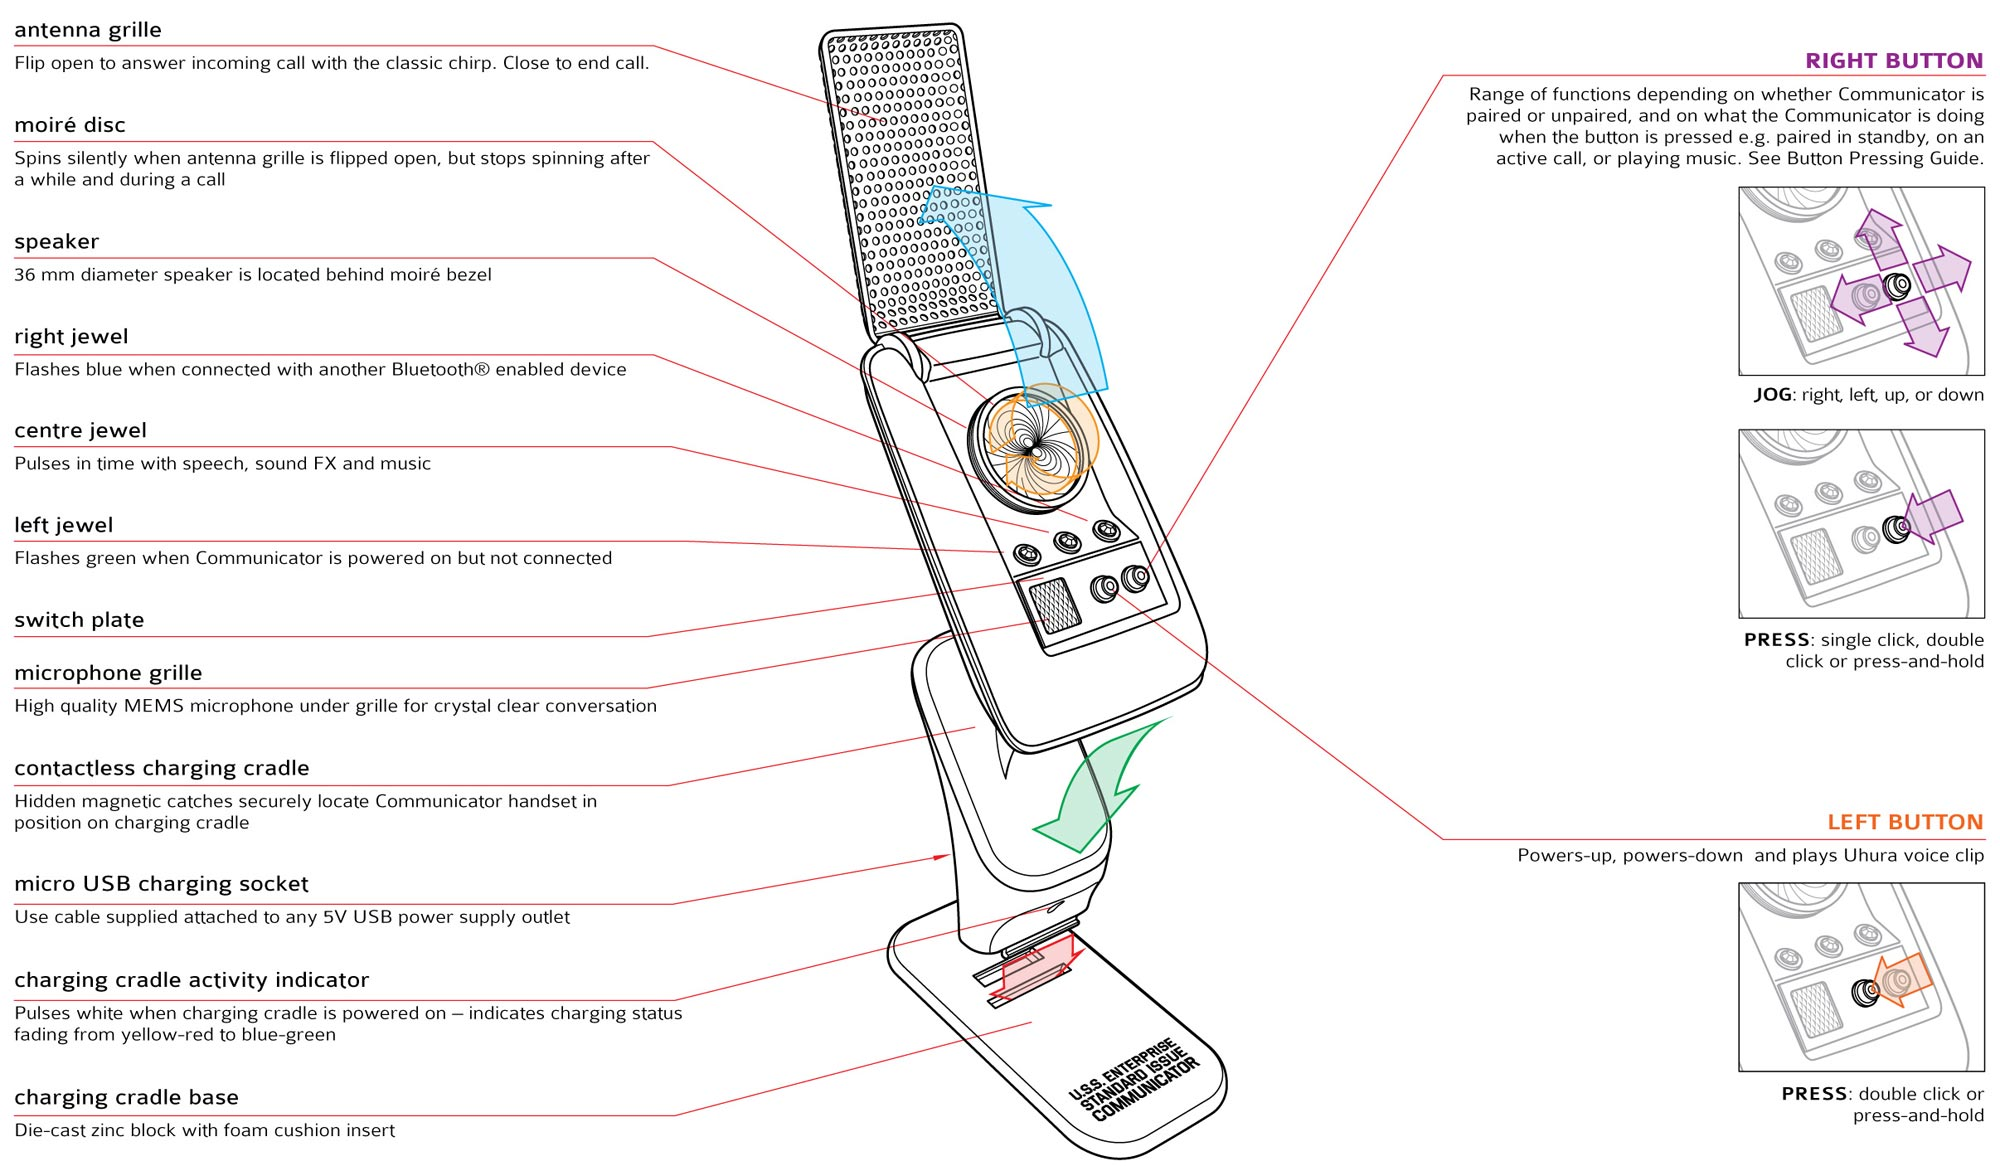 Star Trek Communicator User Manual